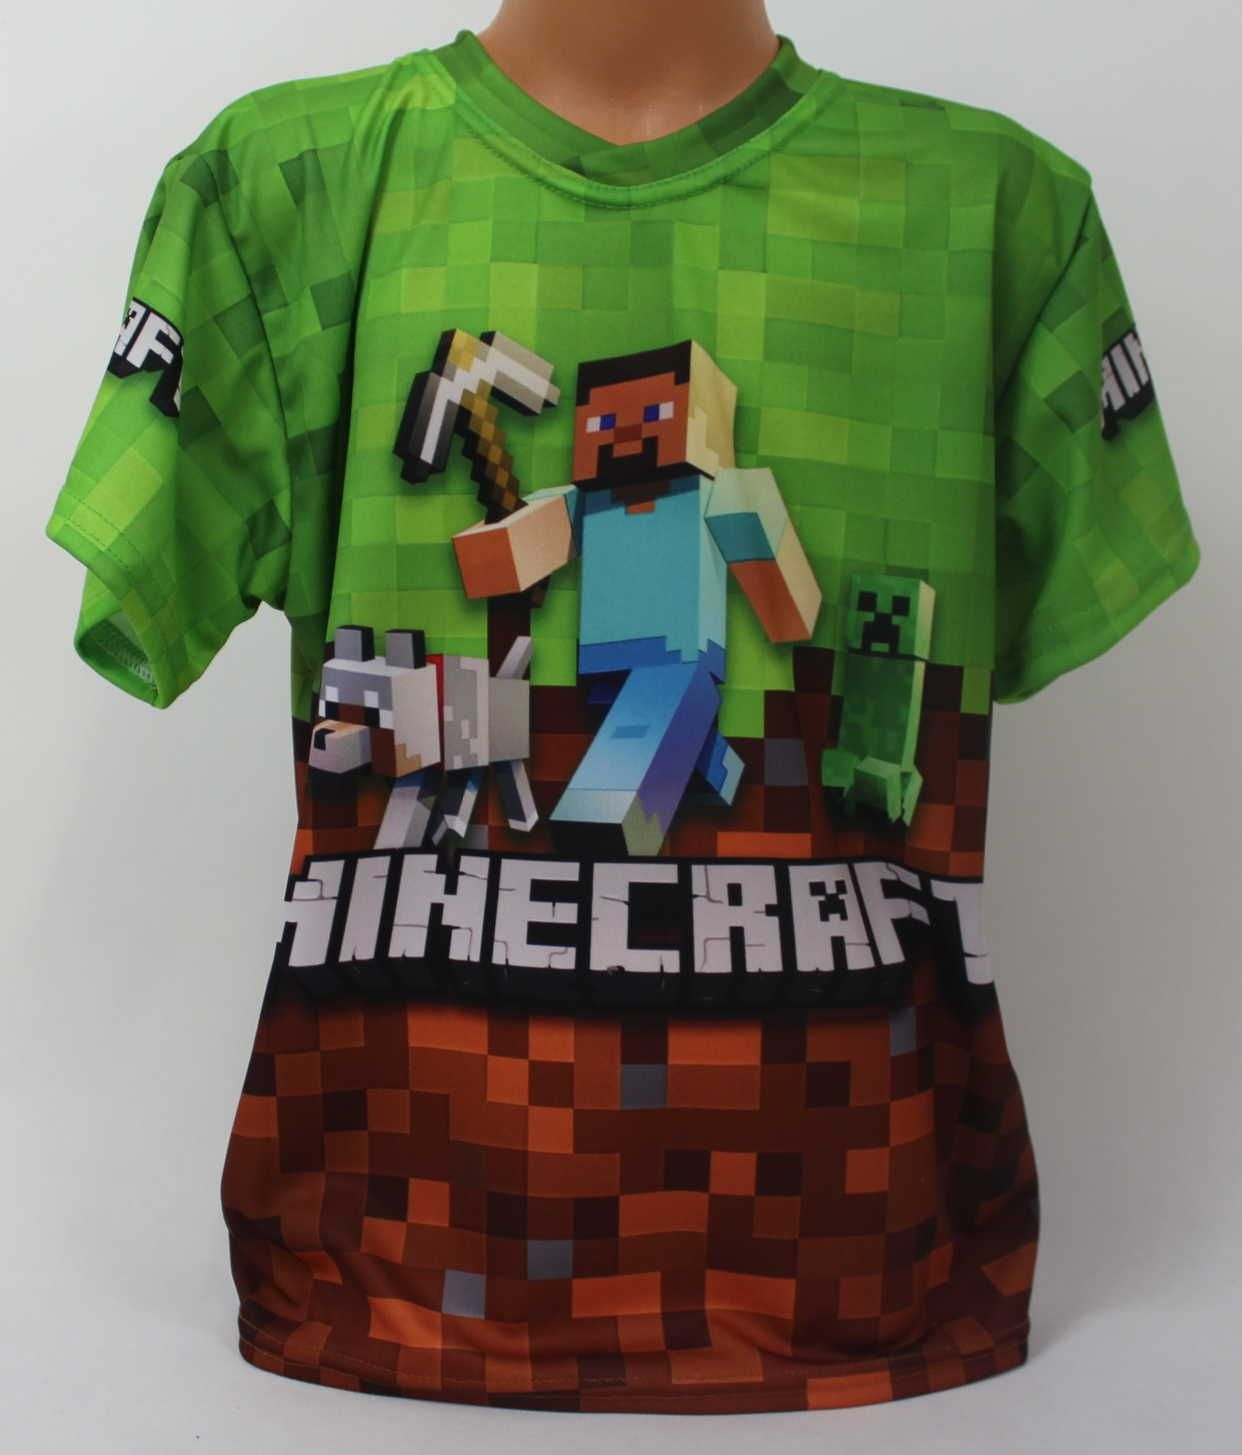 Triko krátký rukáv Minecraft, chlapecké tričko Minecraft, oblečení Minecraft